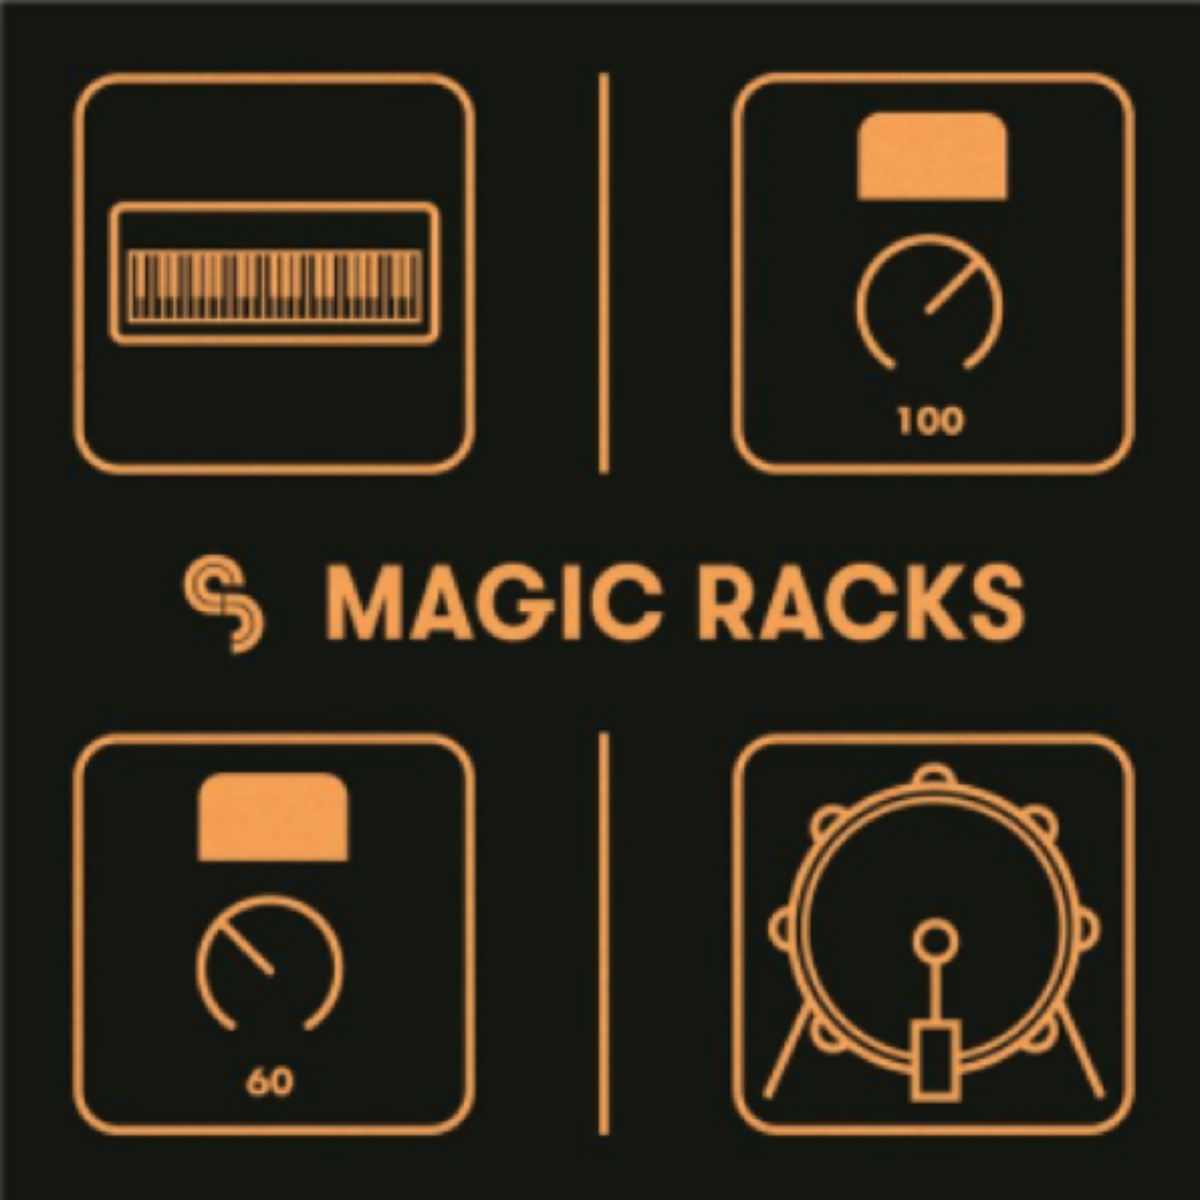 SM Magic Racks